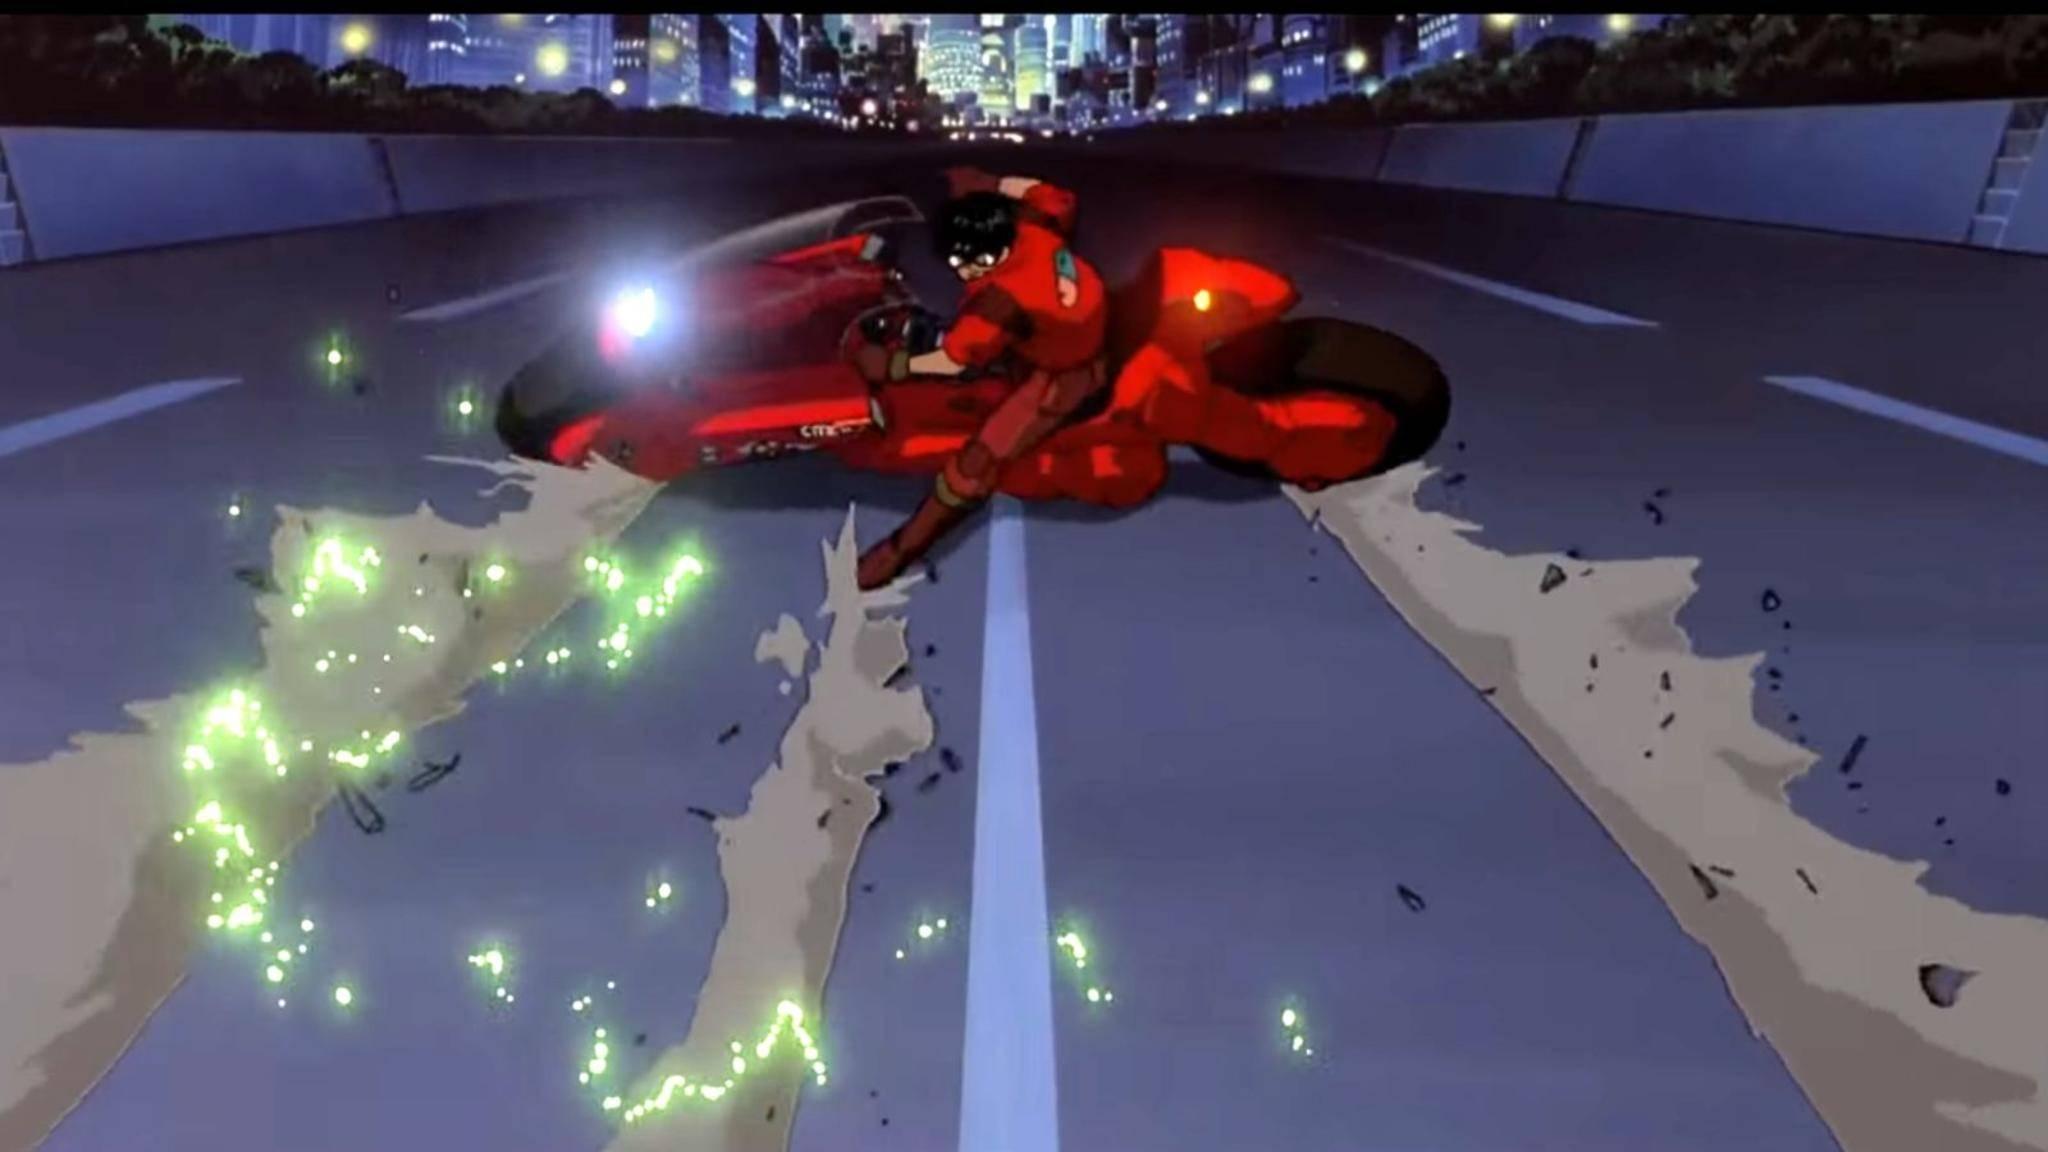 Düst Akira bald über die große Kinoleinwand?